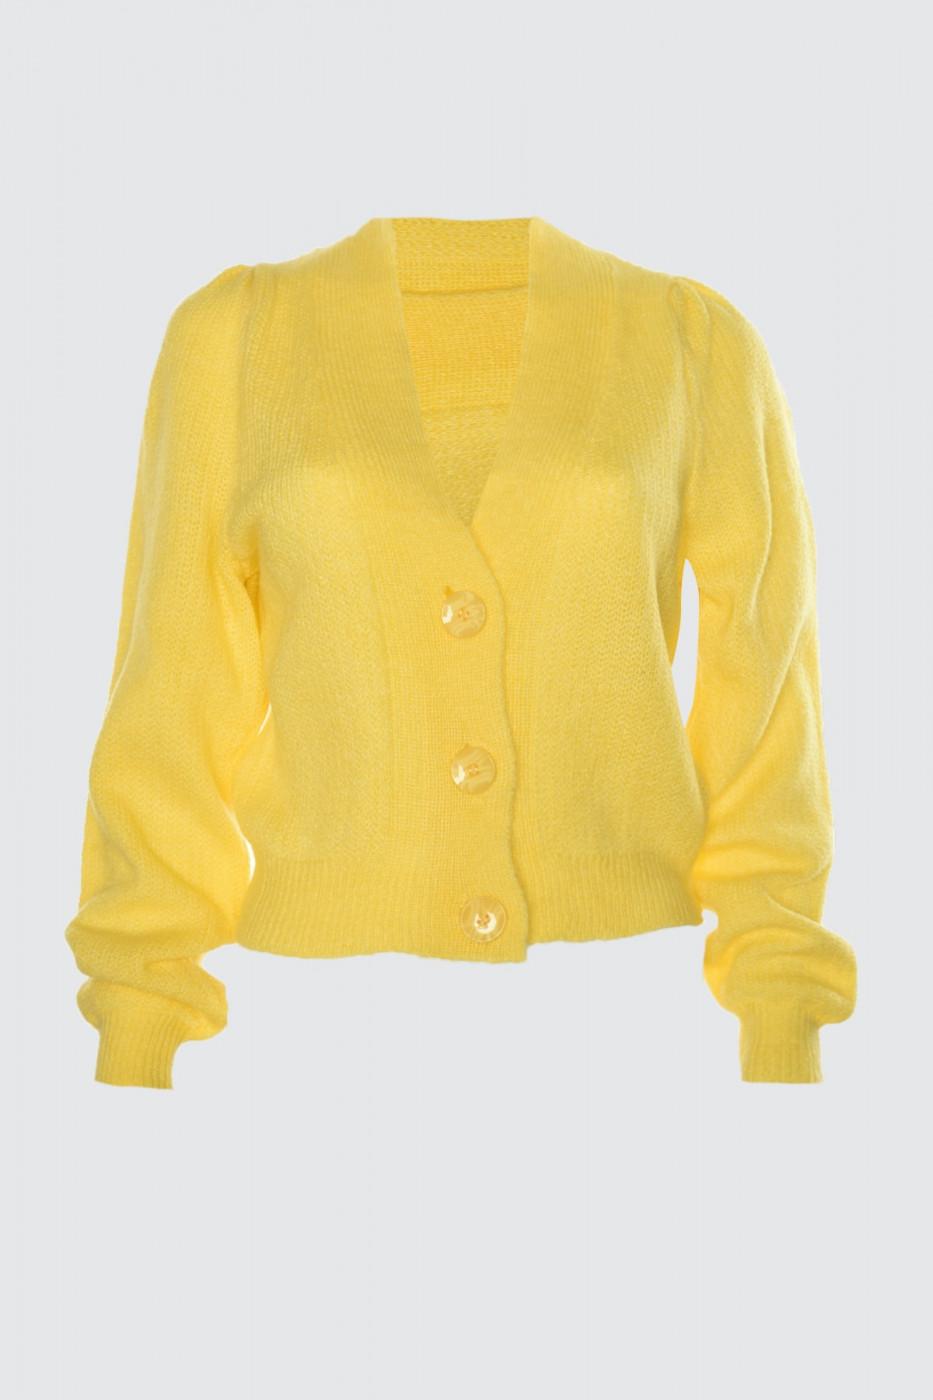 Trendyol Yellow Crop KnitWear Cardigan